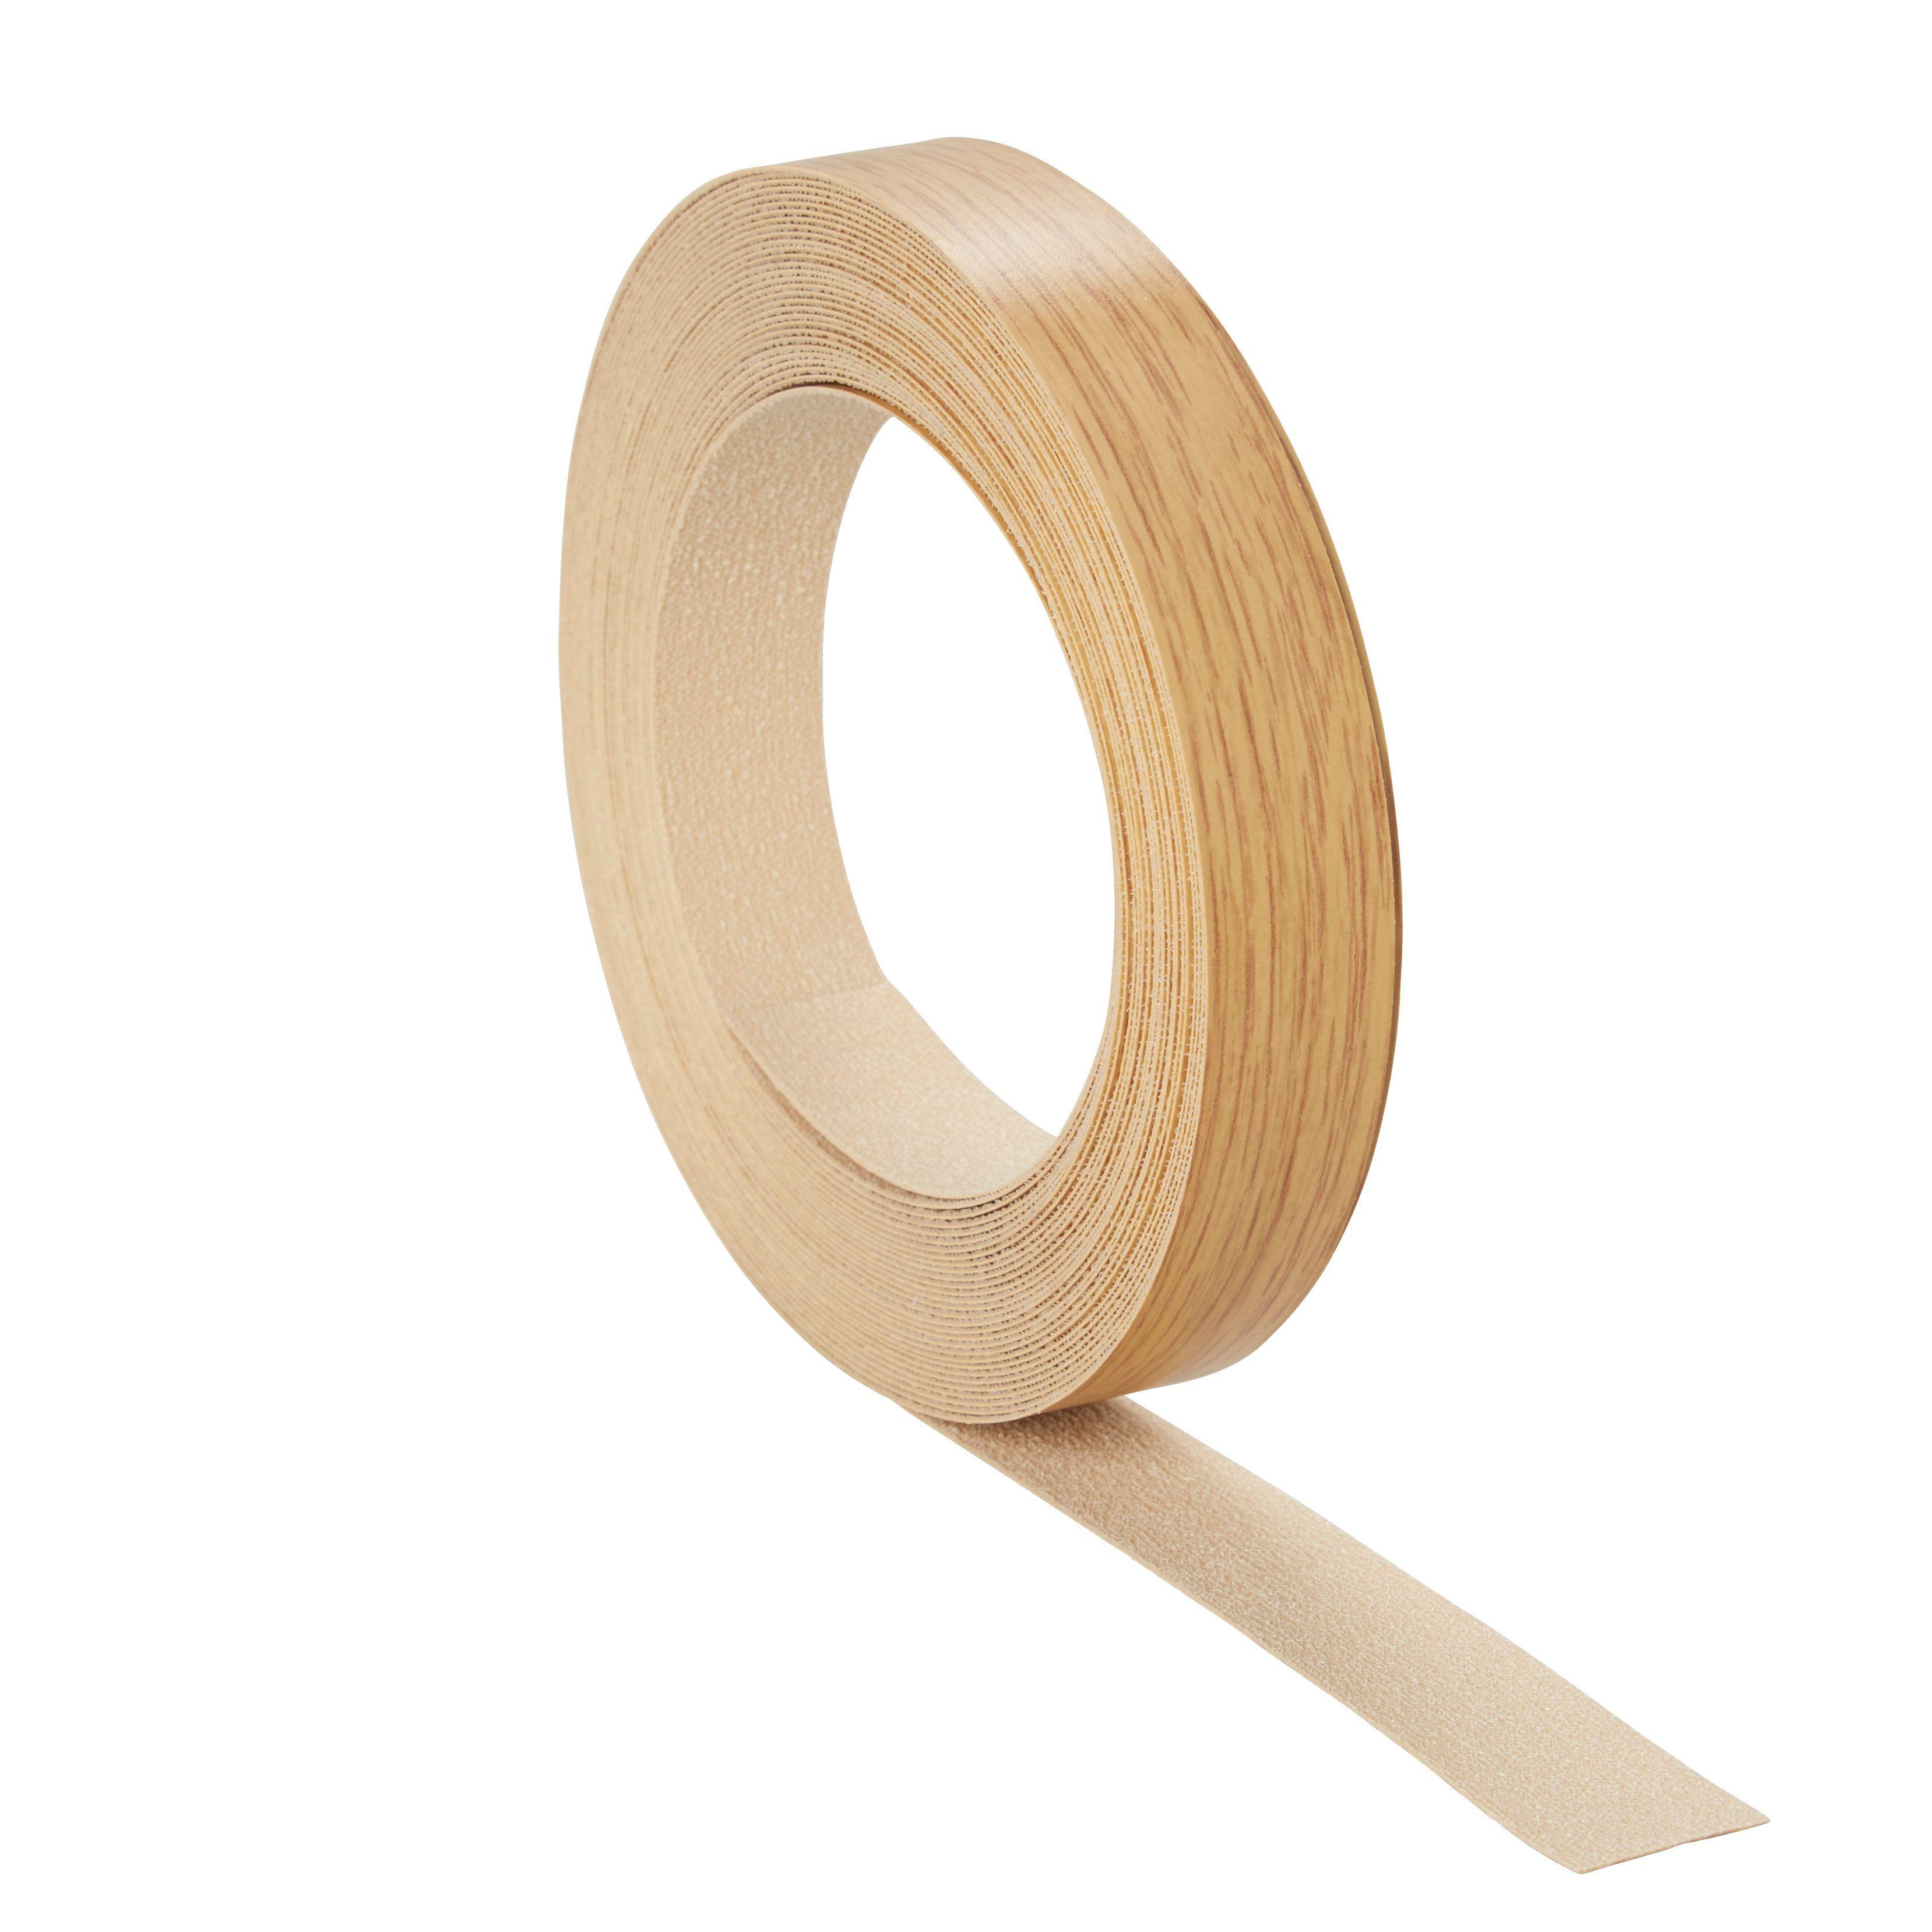 cooke lewis matt oak oak effect iron on edging tape l. Black Bedroom Furniture Sets. Home Design Ideas